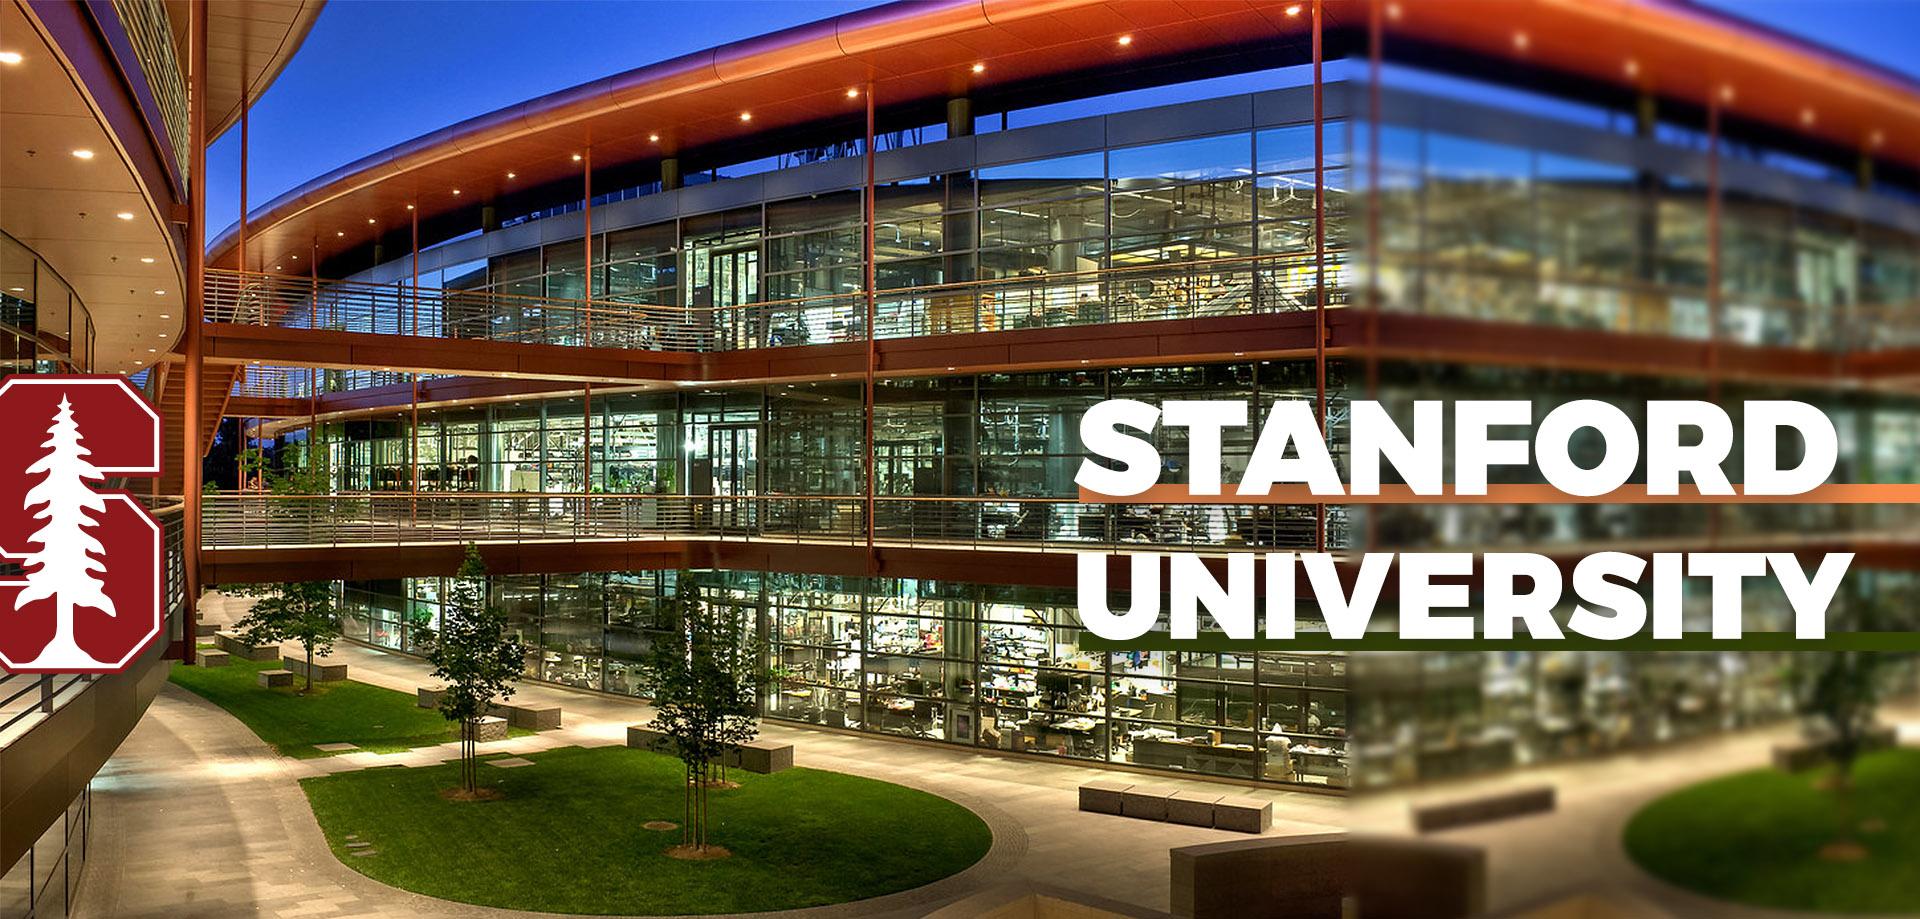 afterteam projects wordpress 06 stanford university 2020 banner01